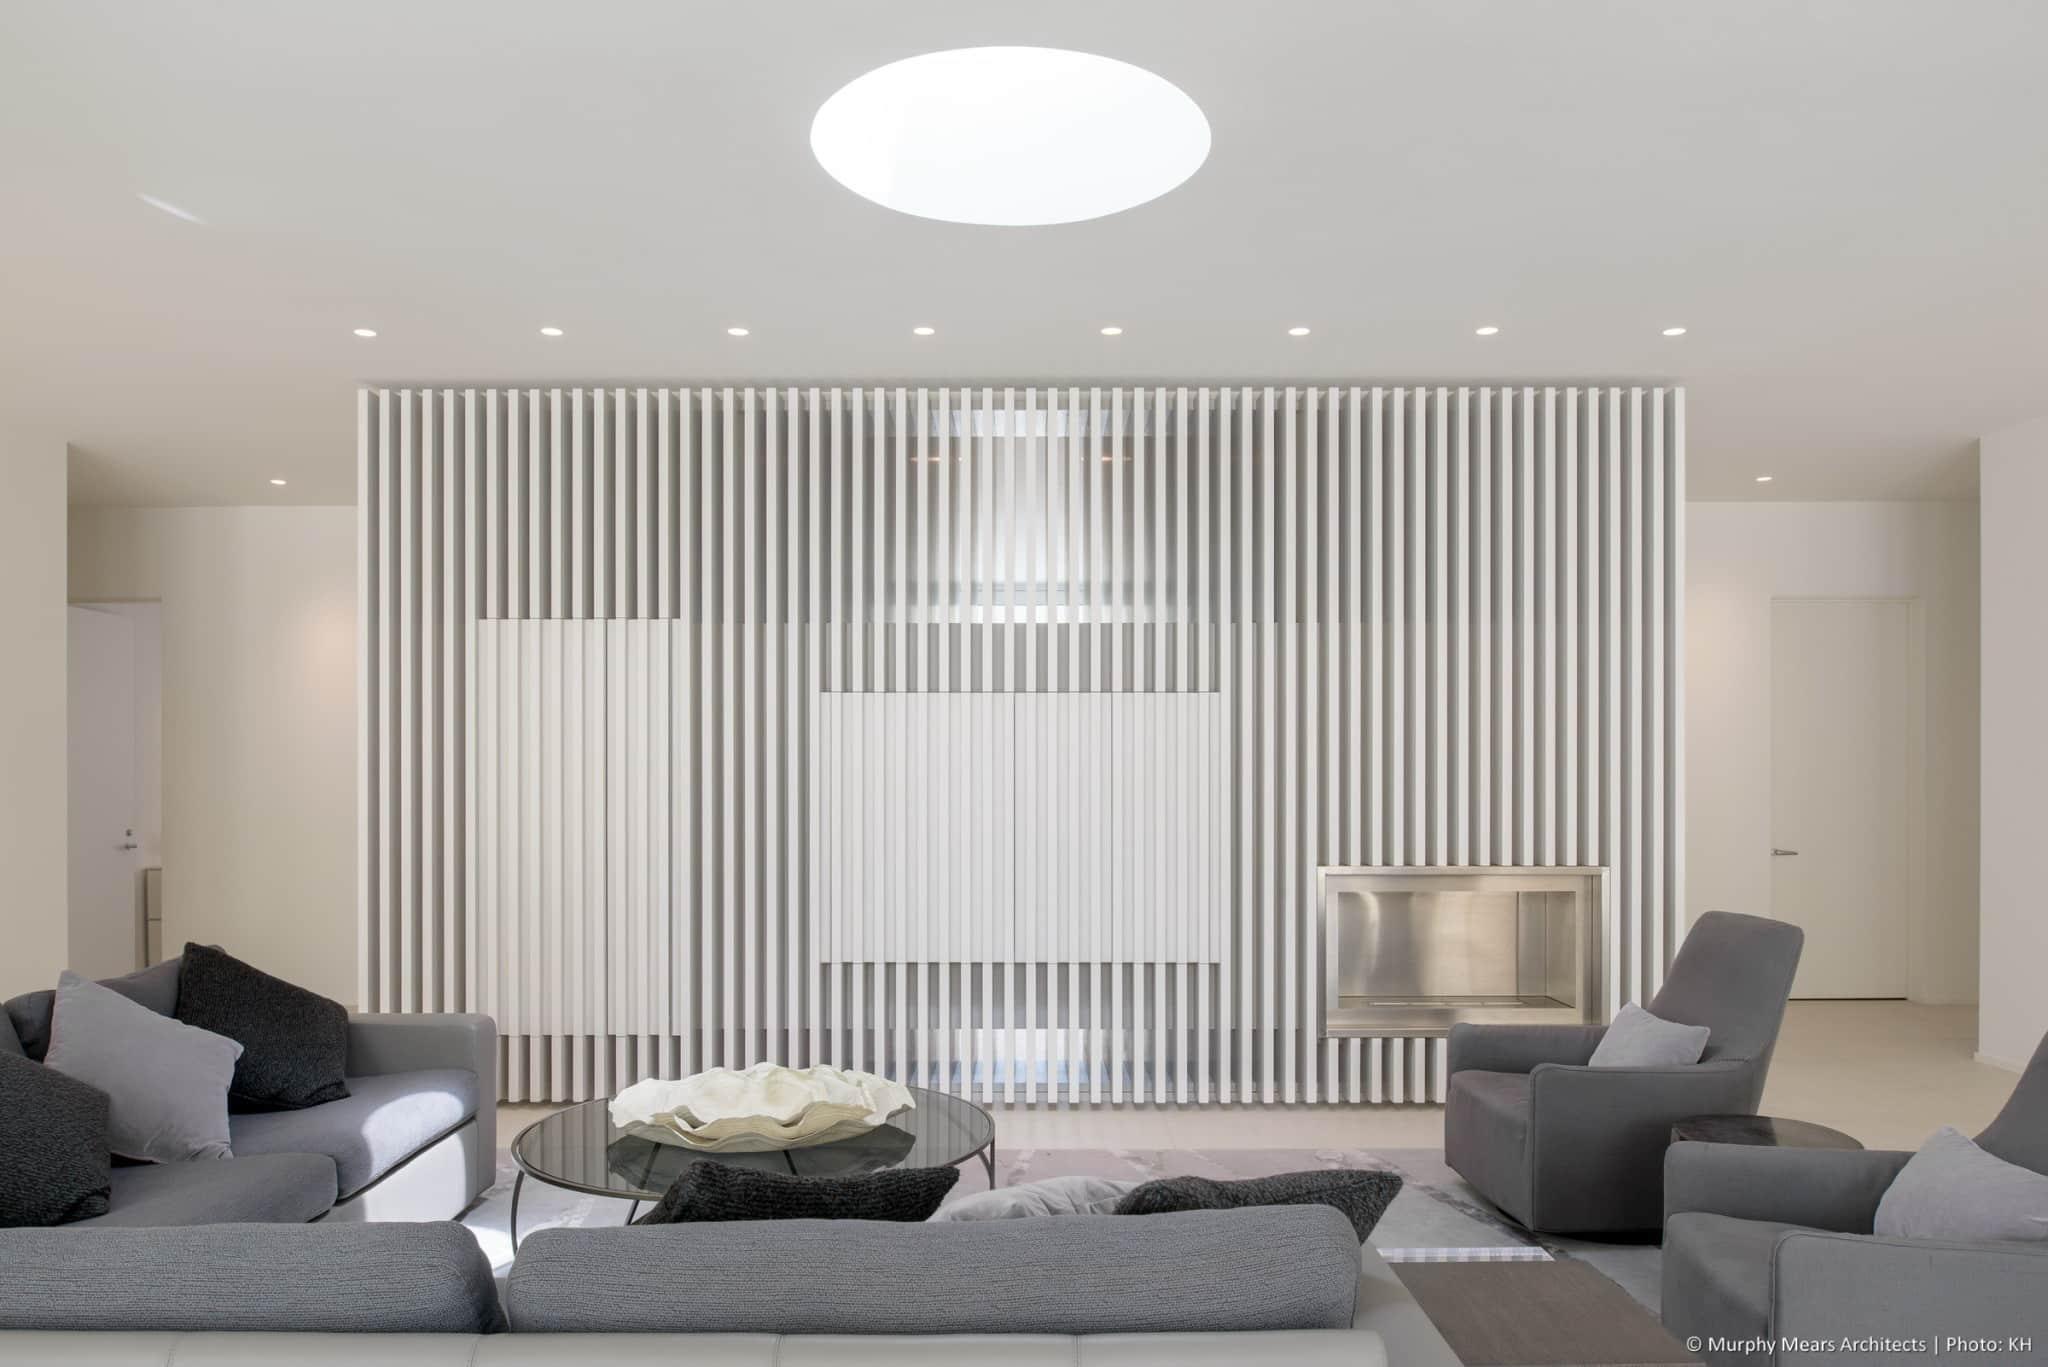 w-mid-century-modern-home-neuhaus-harwood-taylor-renovation-centerpiece-fin-wall-skylight.jpg